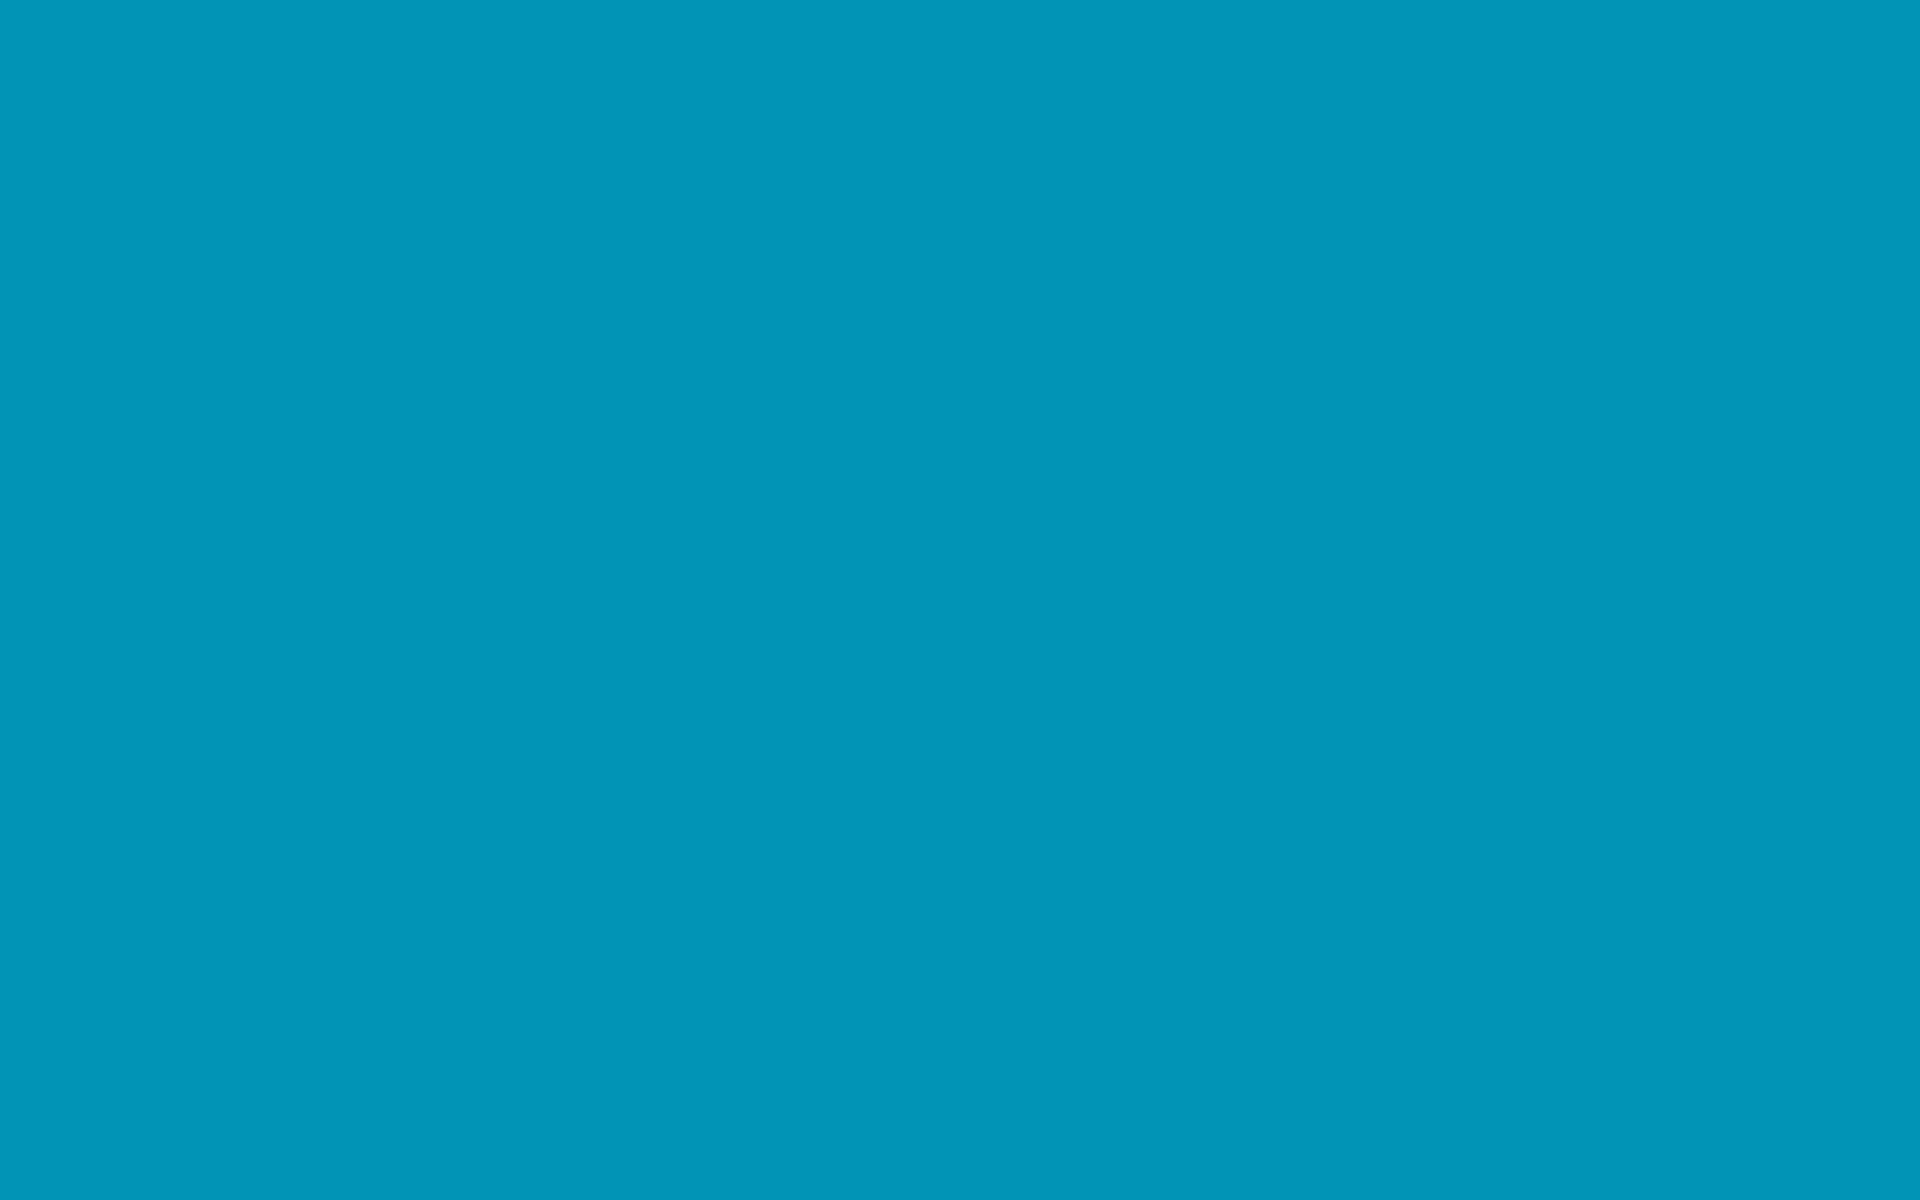 1920x1200 Bondi Blue Solid Color Background